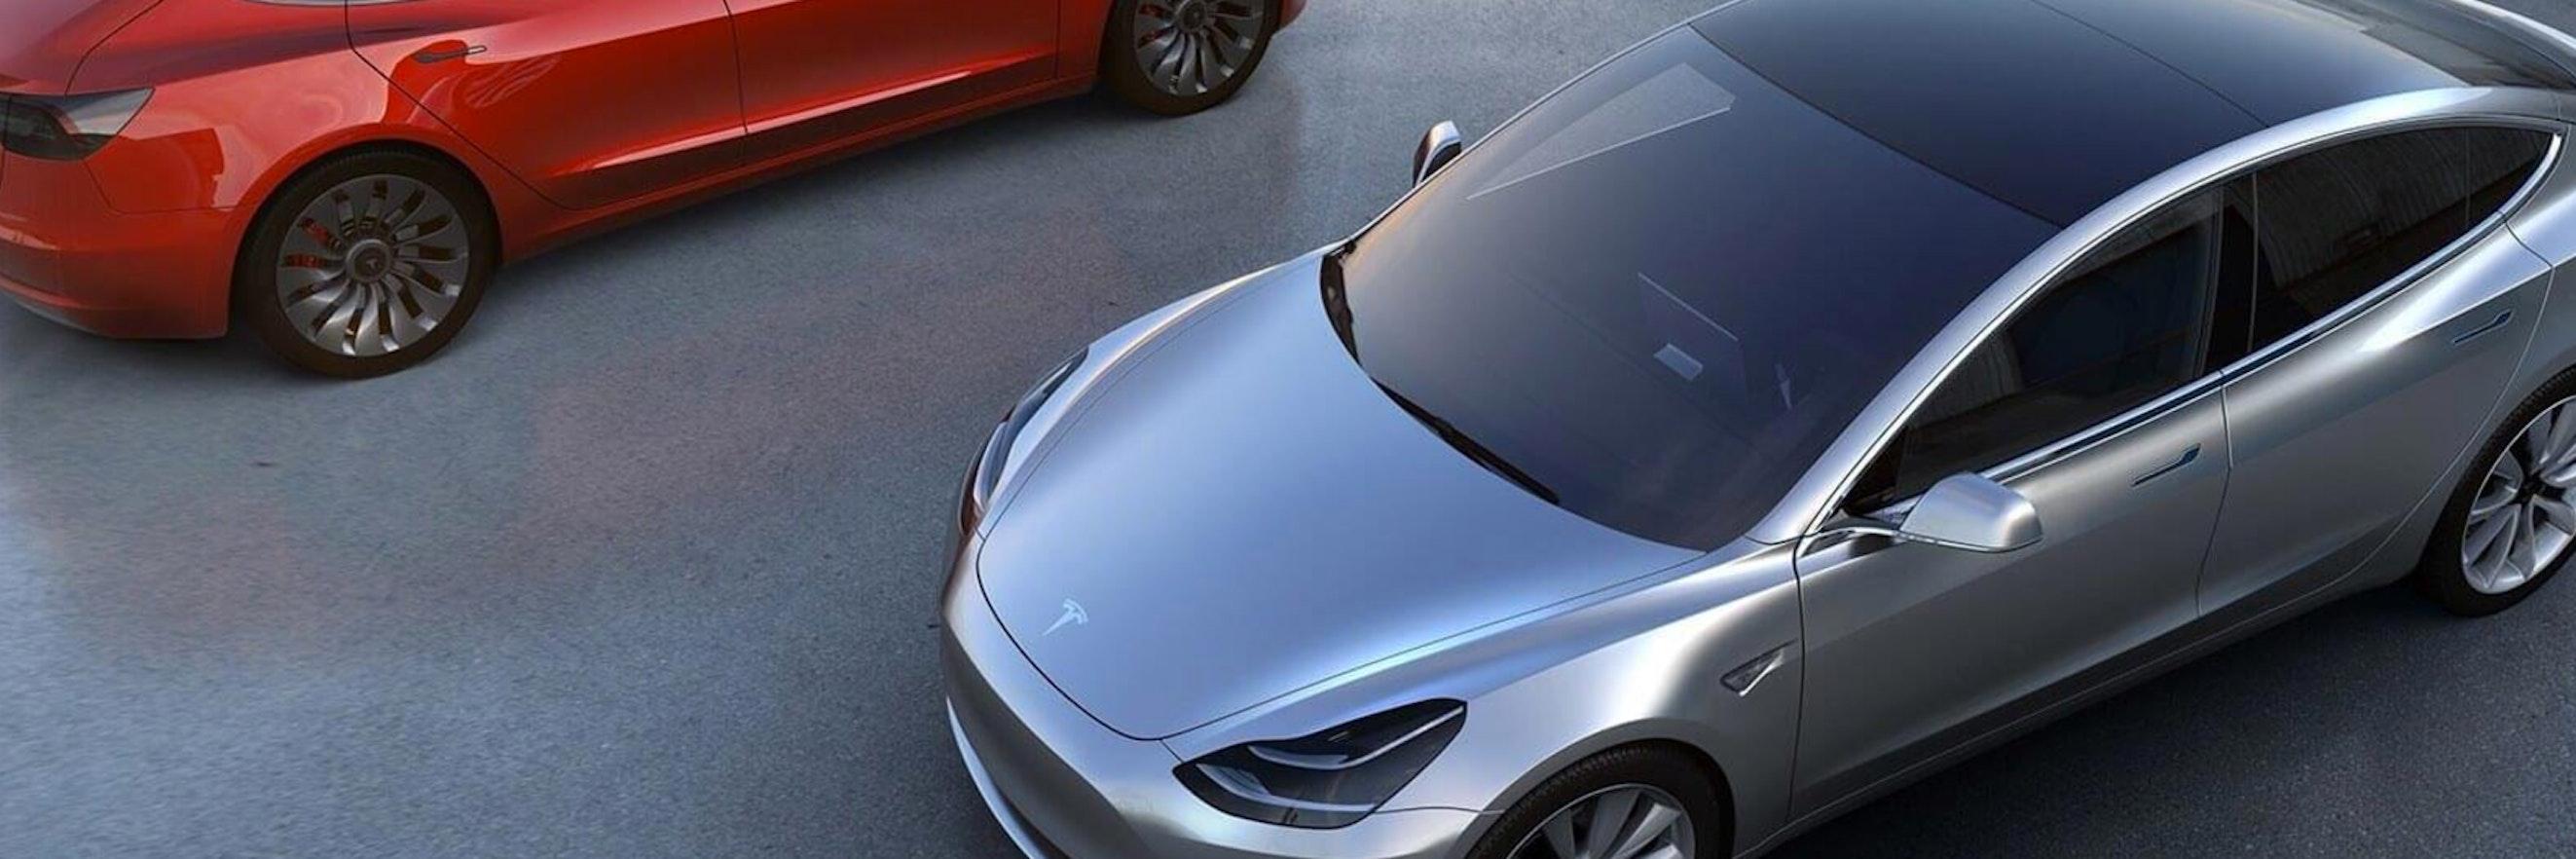 Terminator Driving Tesla Auto Car